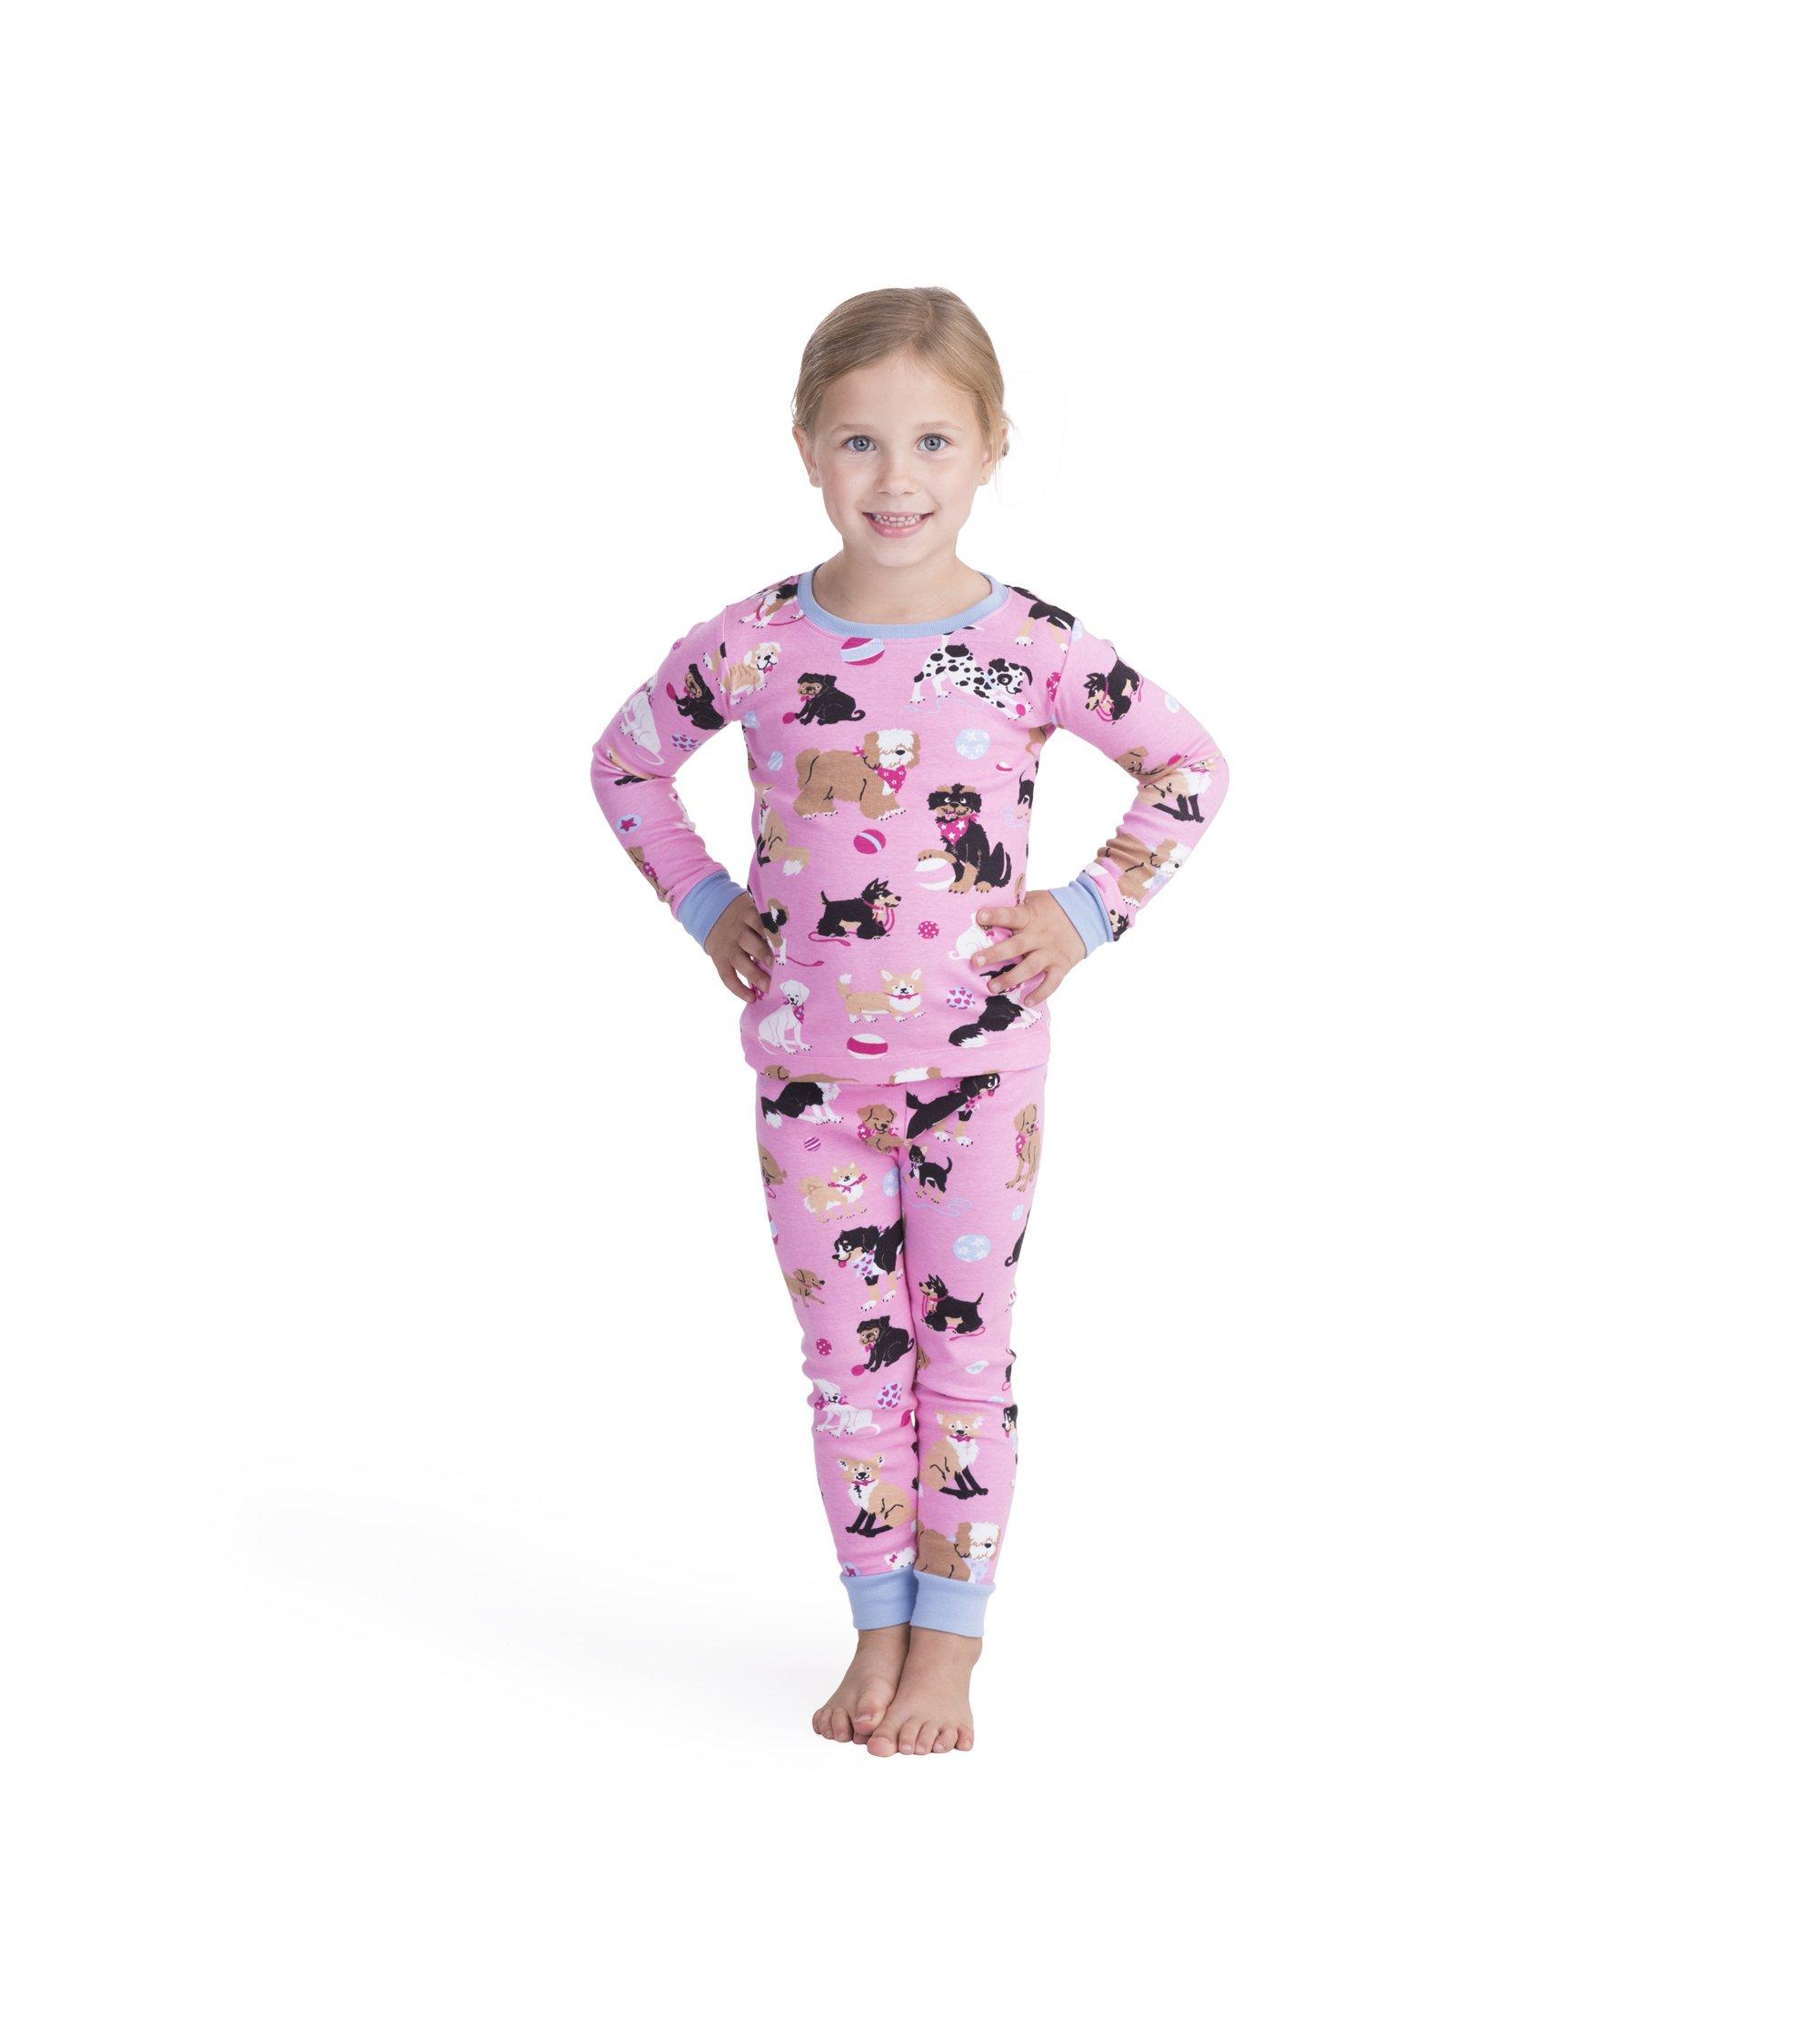 289fe1bfec5aaf Galleon - Hatley Girls' Little Organic Cotton Long Sleeve Printed Pajama  Sets, Cute Pups, 5 Years